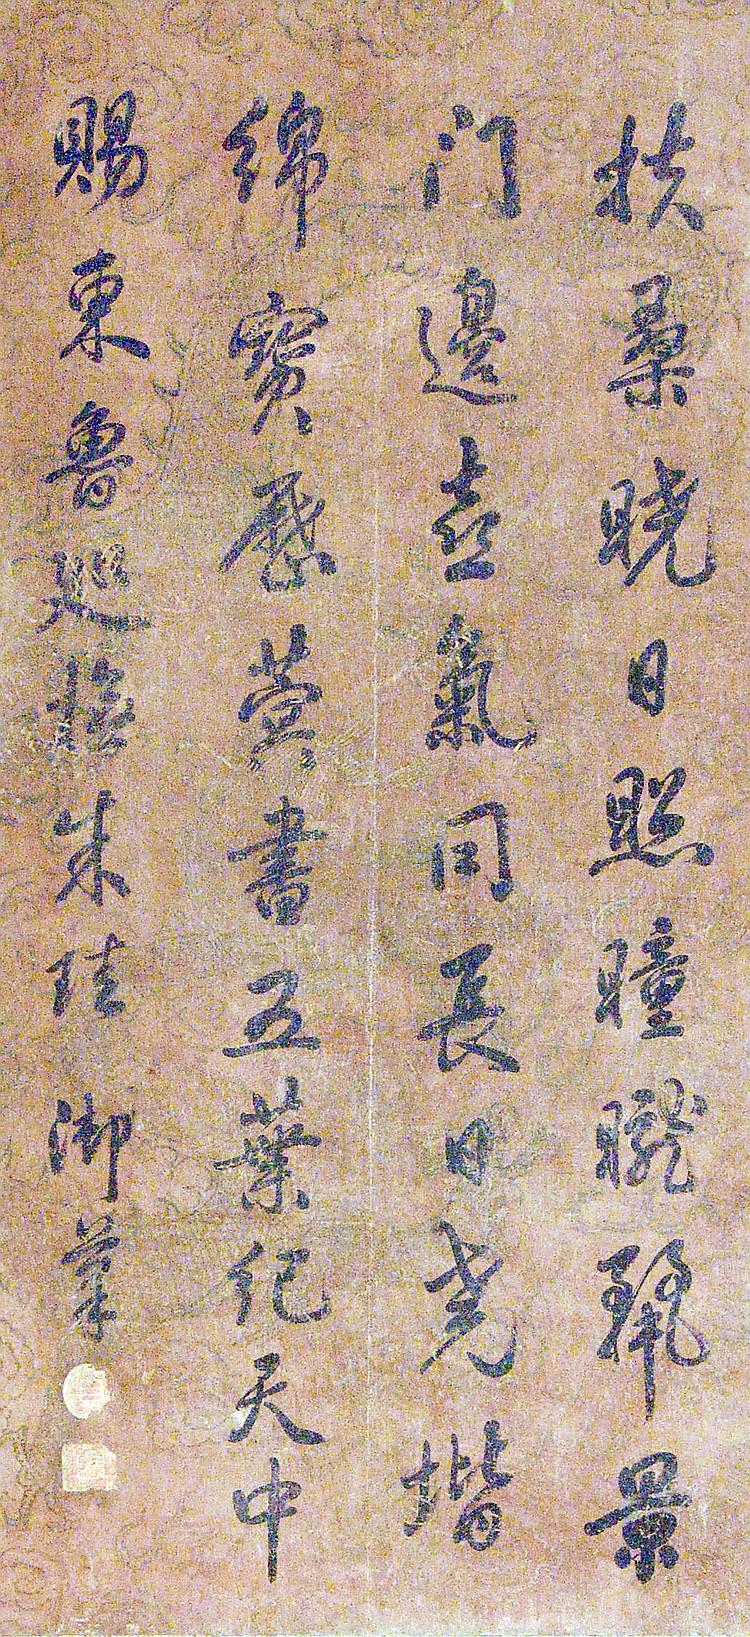 Emperor Qianlong (1711 - 1799) 乾 隆 皇 帝 Running Script Calligraphy Official Palace Seal 行 書 七 言 詩 御 款